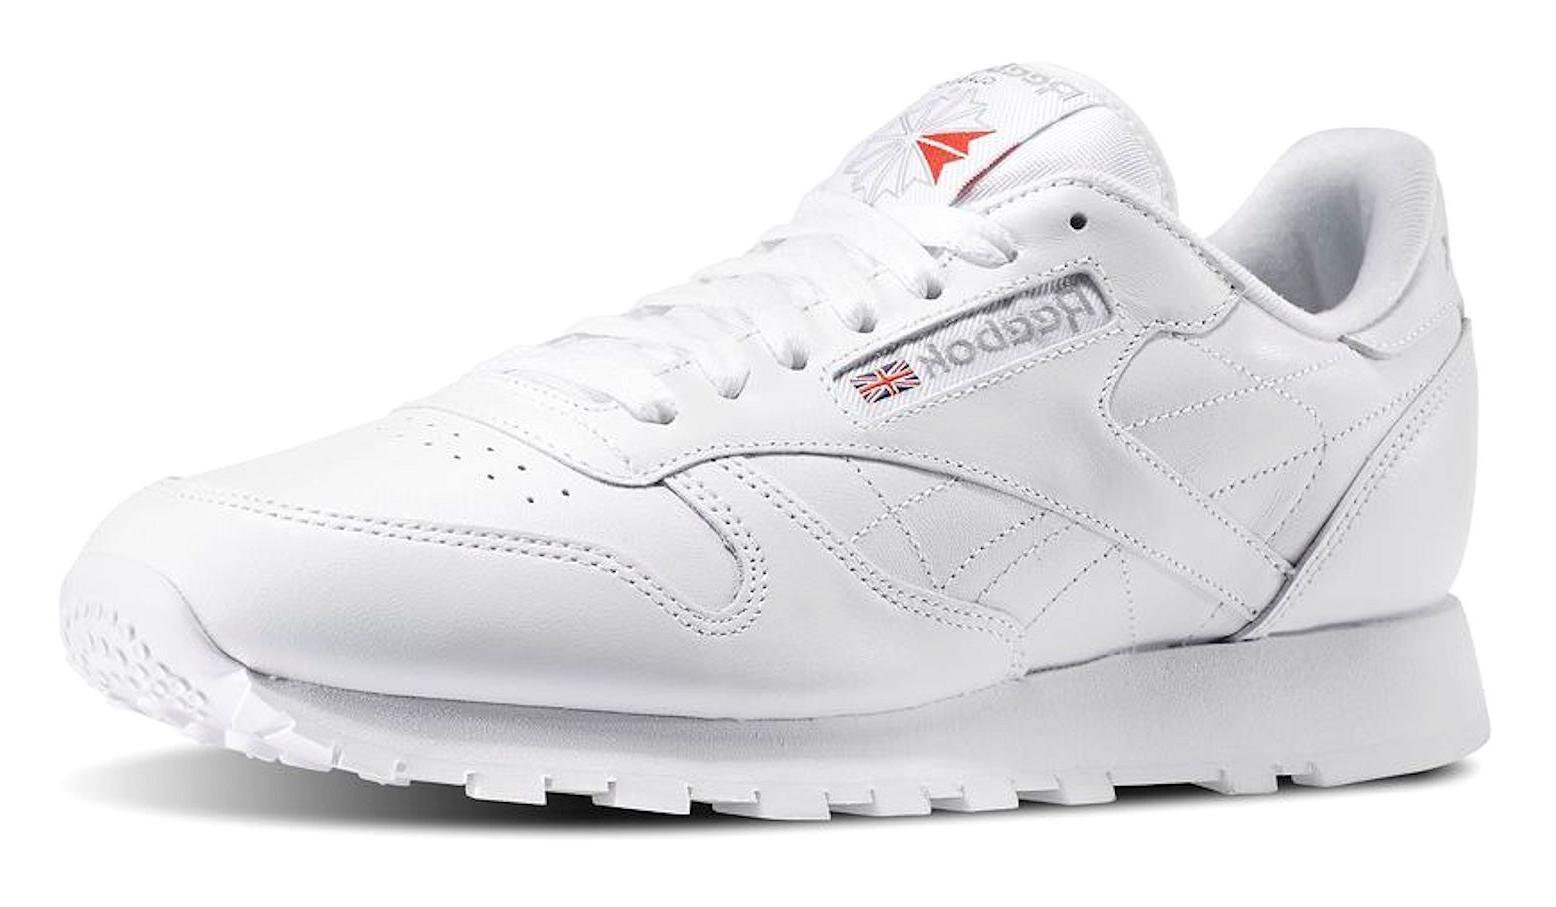 Reebok Classic Leather White, Light Grey Mens Running Tennis